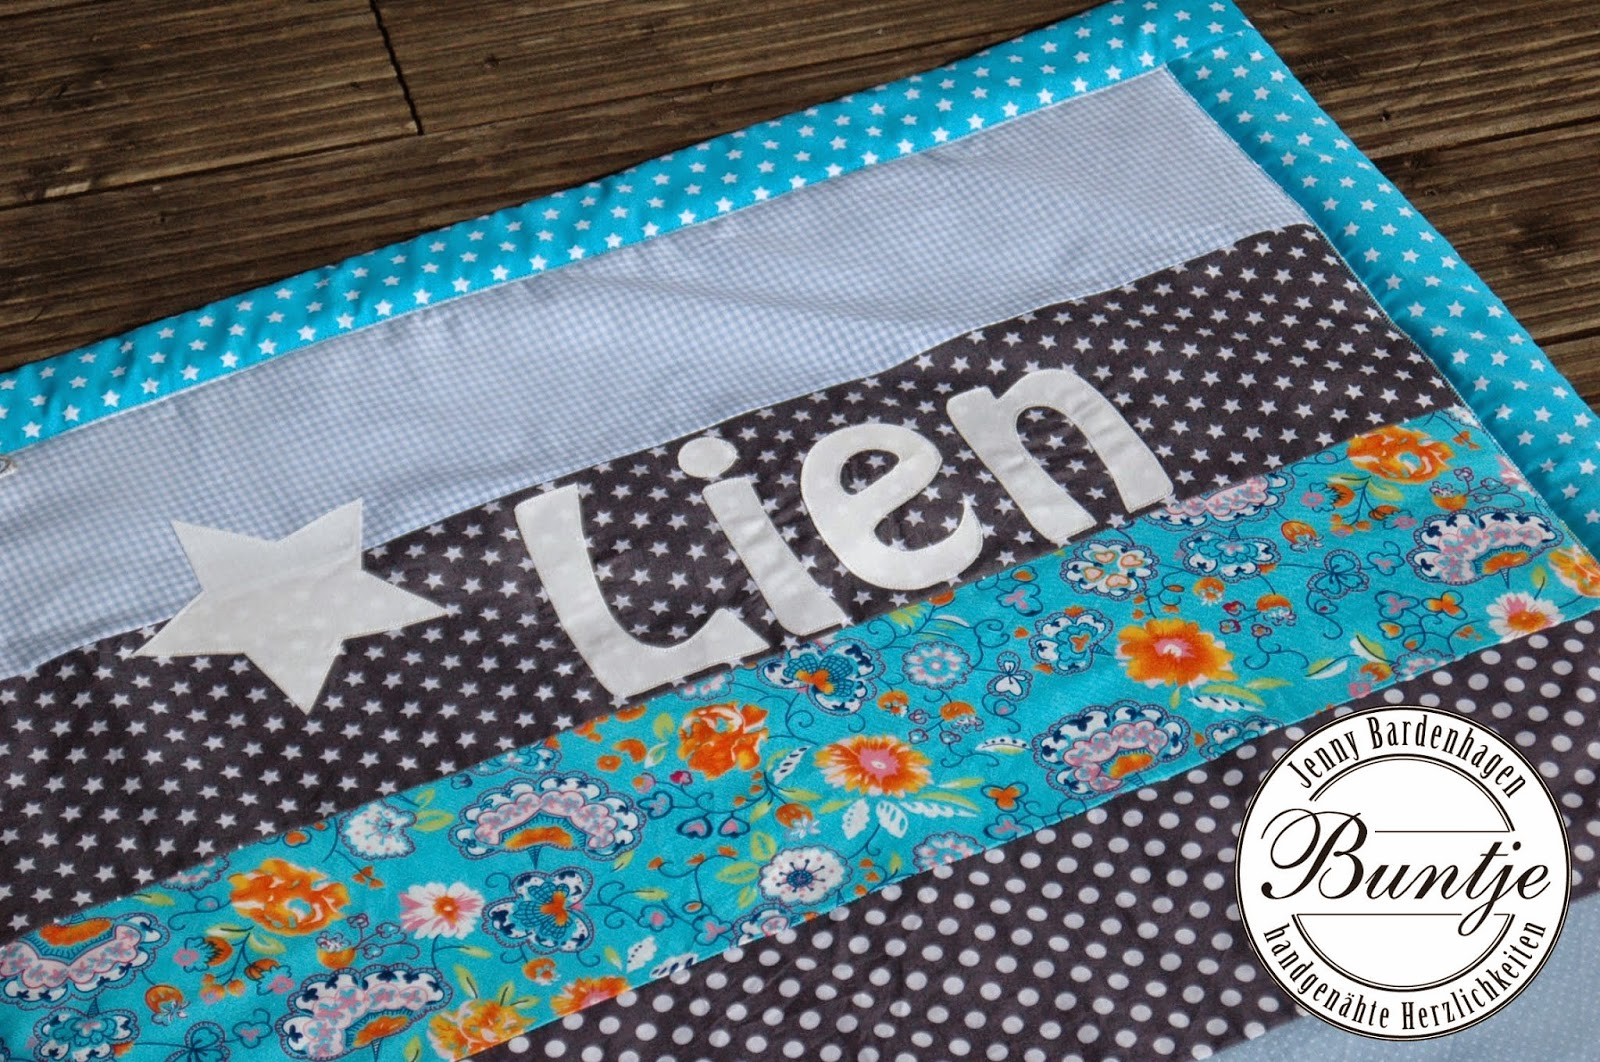 Krabbeldecke Geschenk Geburt Taufe Name Junge Kuscheldecke Decke Baby hellblau türkis grau Baumwolle Fleece Webband nähen Buntje handmade Lien